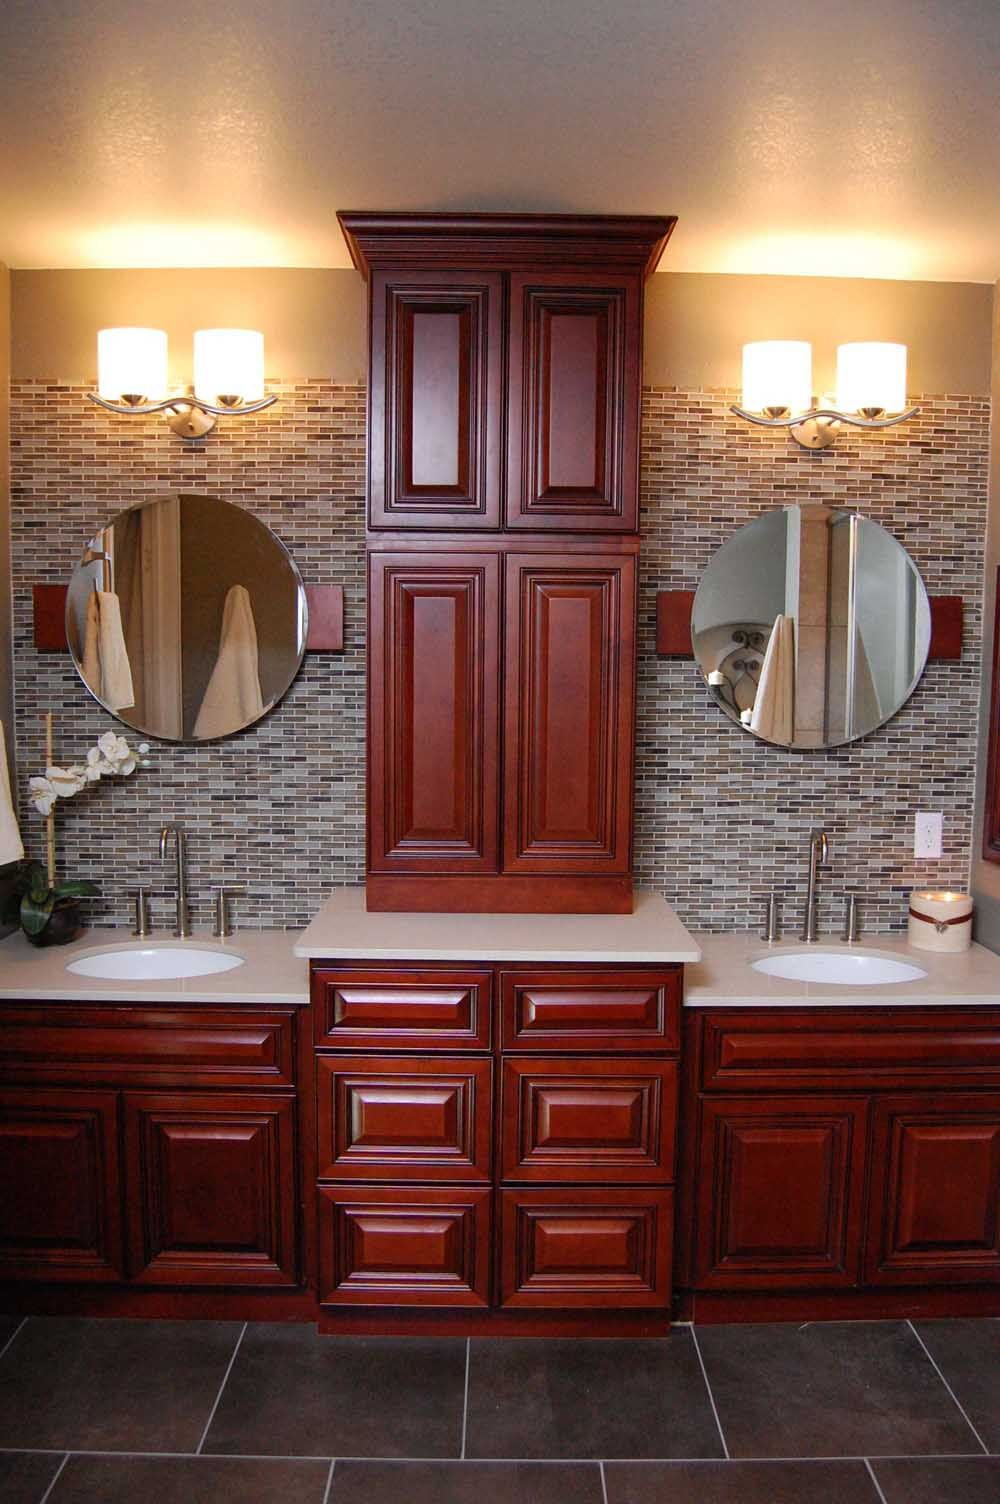 Cherryville Bathroom Vanities by RTA Cabinet Store   crafts ...